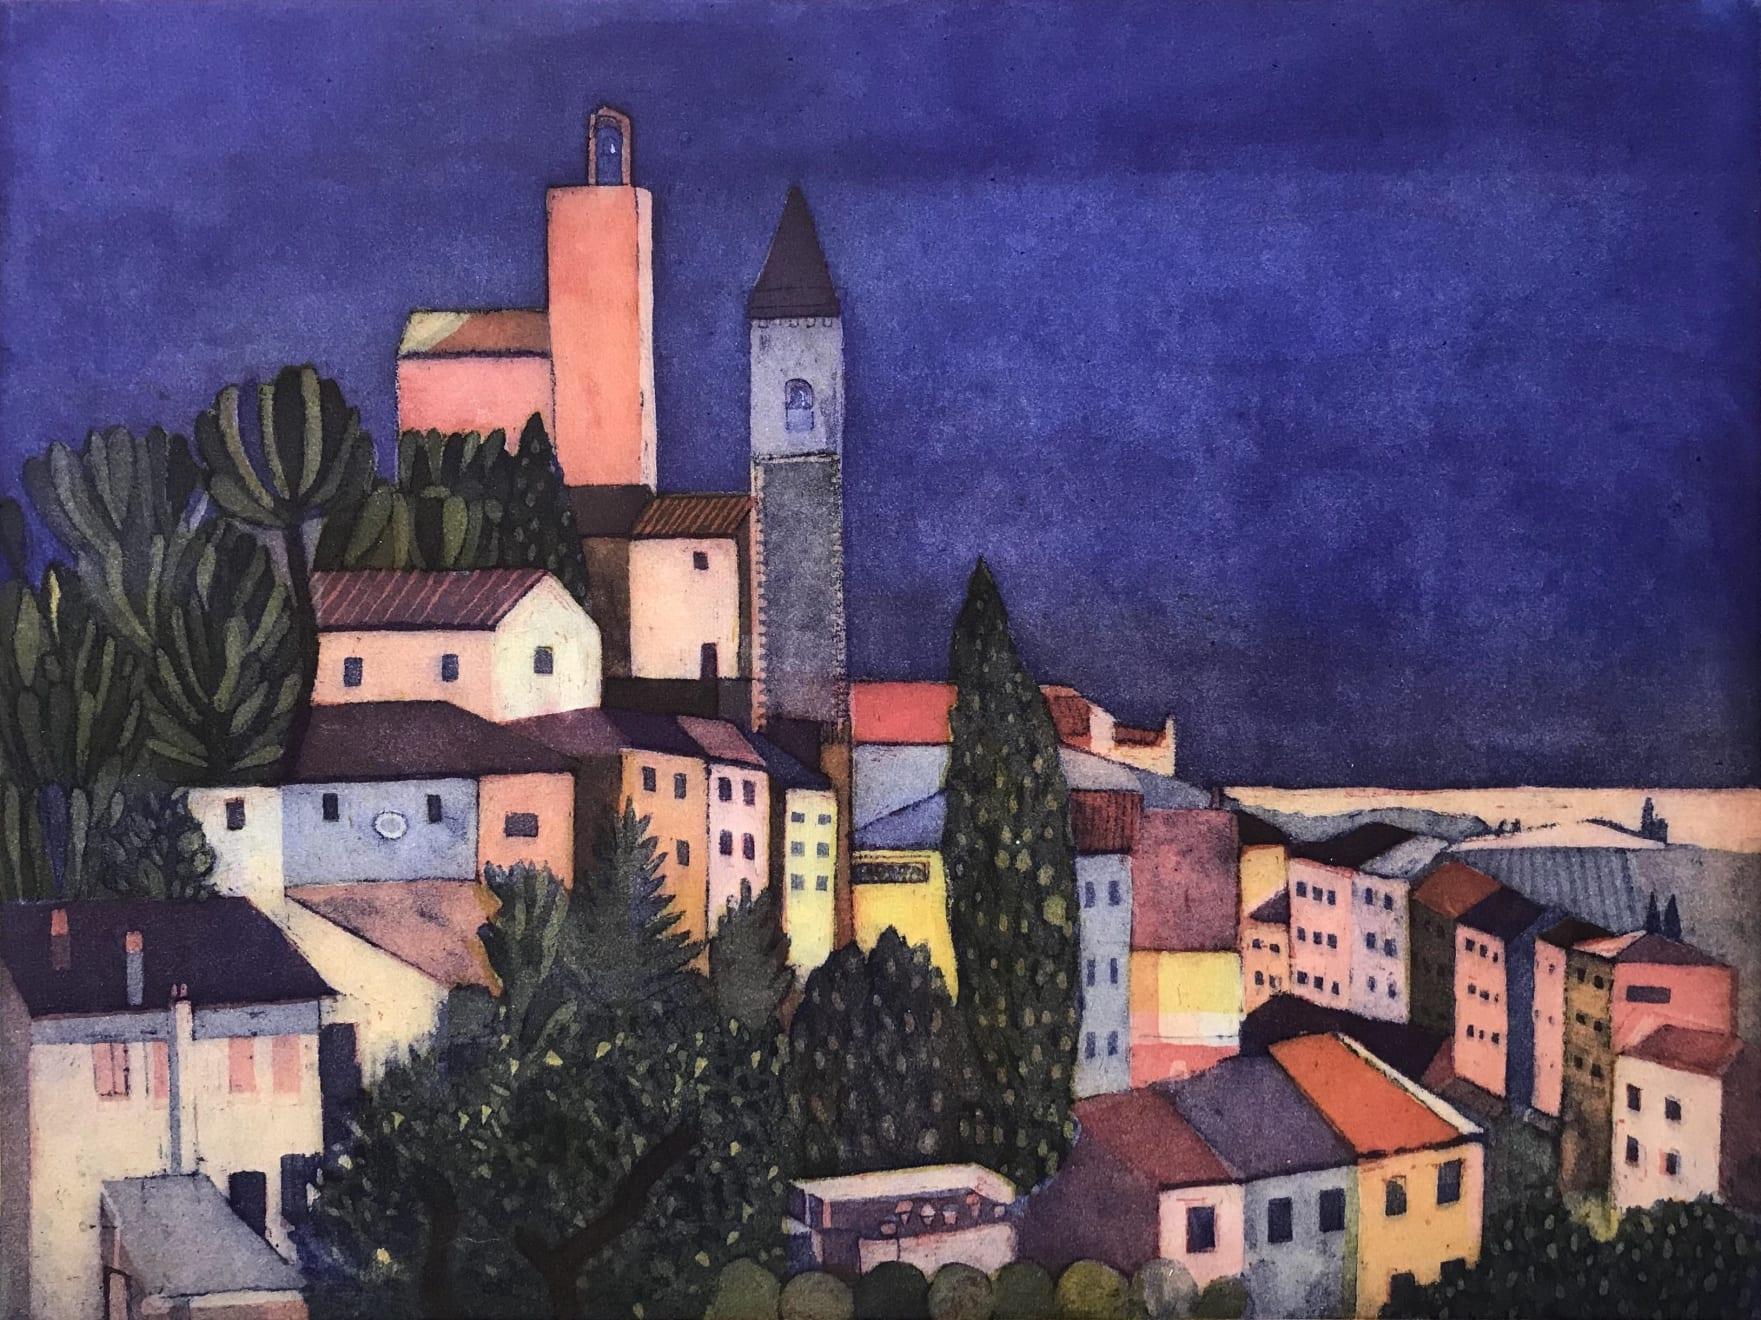 Karen Keogh, Dopo Pranzo, Toscana , 2020